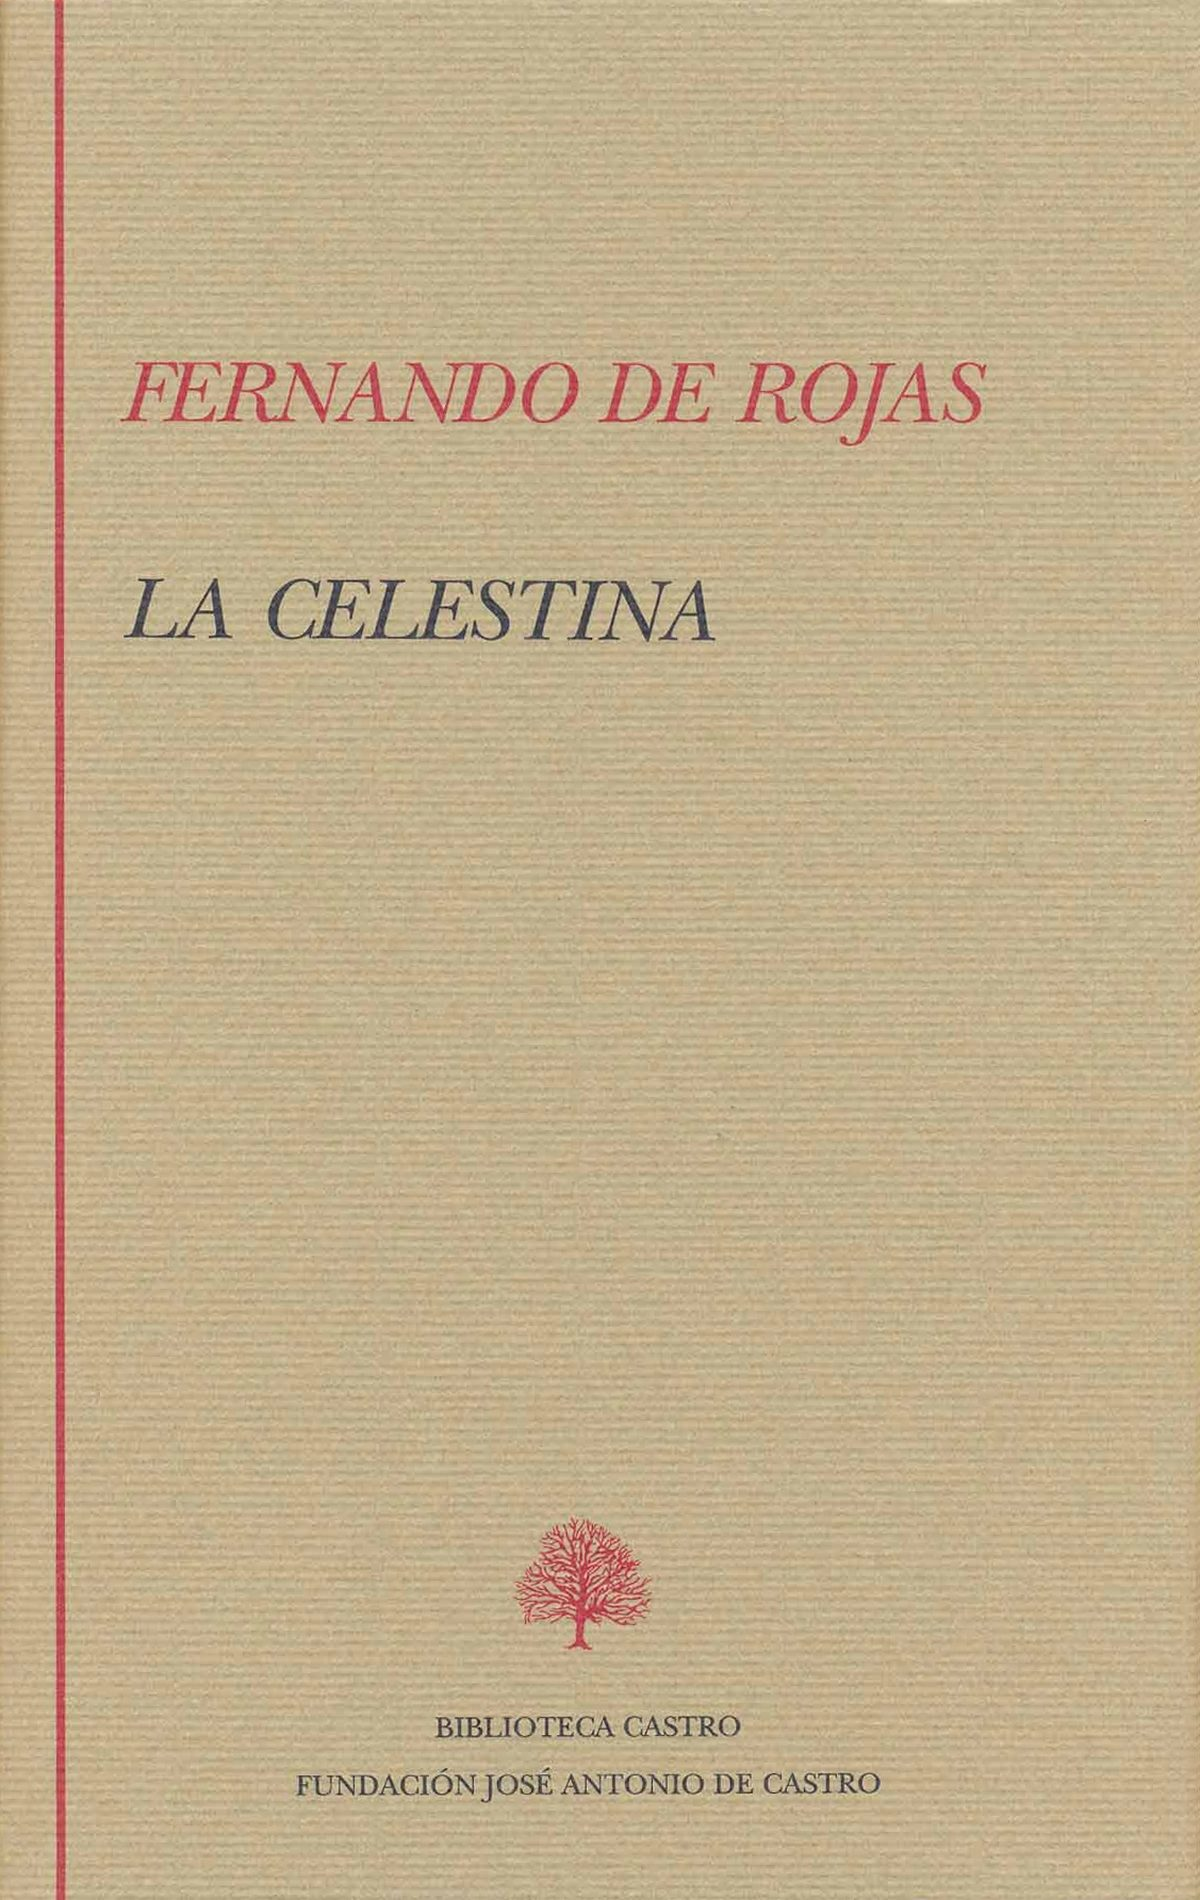 La Celestina, Tragicomedia De Calisto Y Melibea por Fernando De Rojas epub